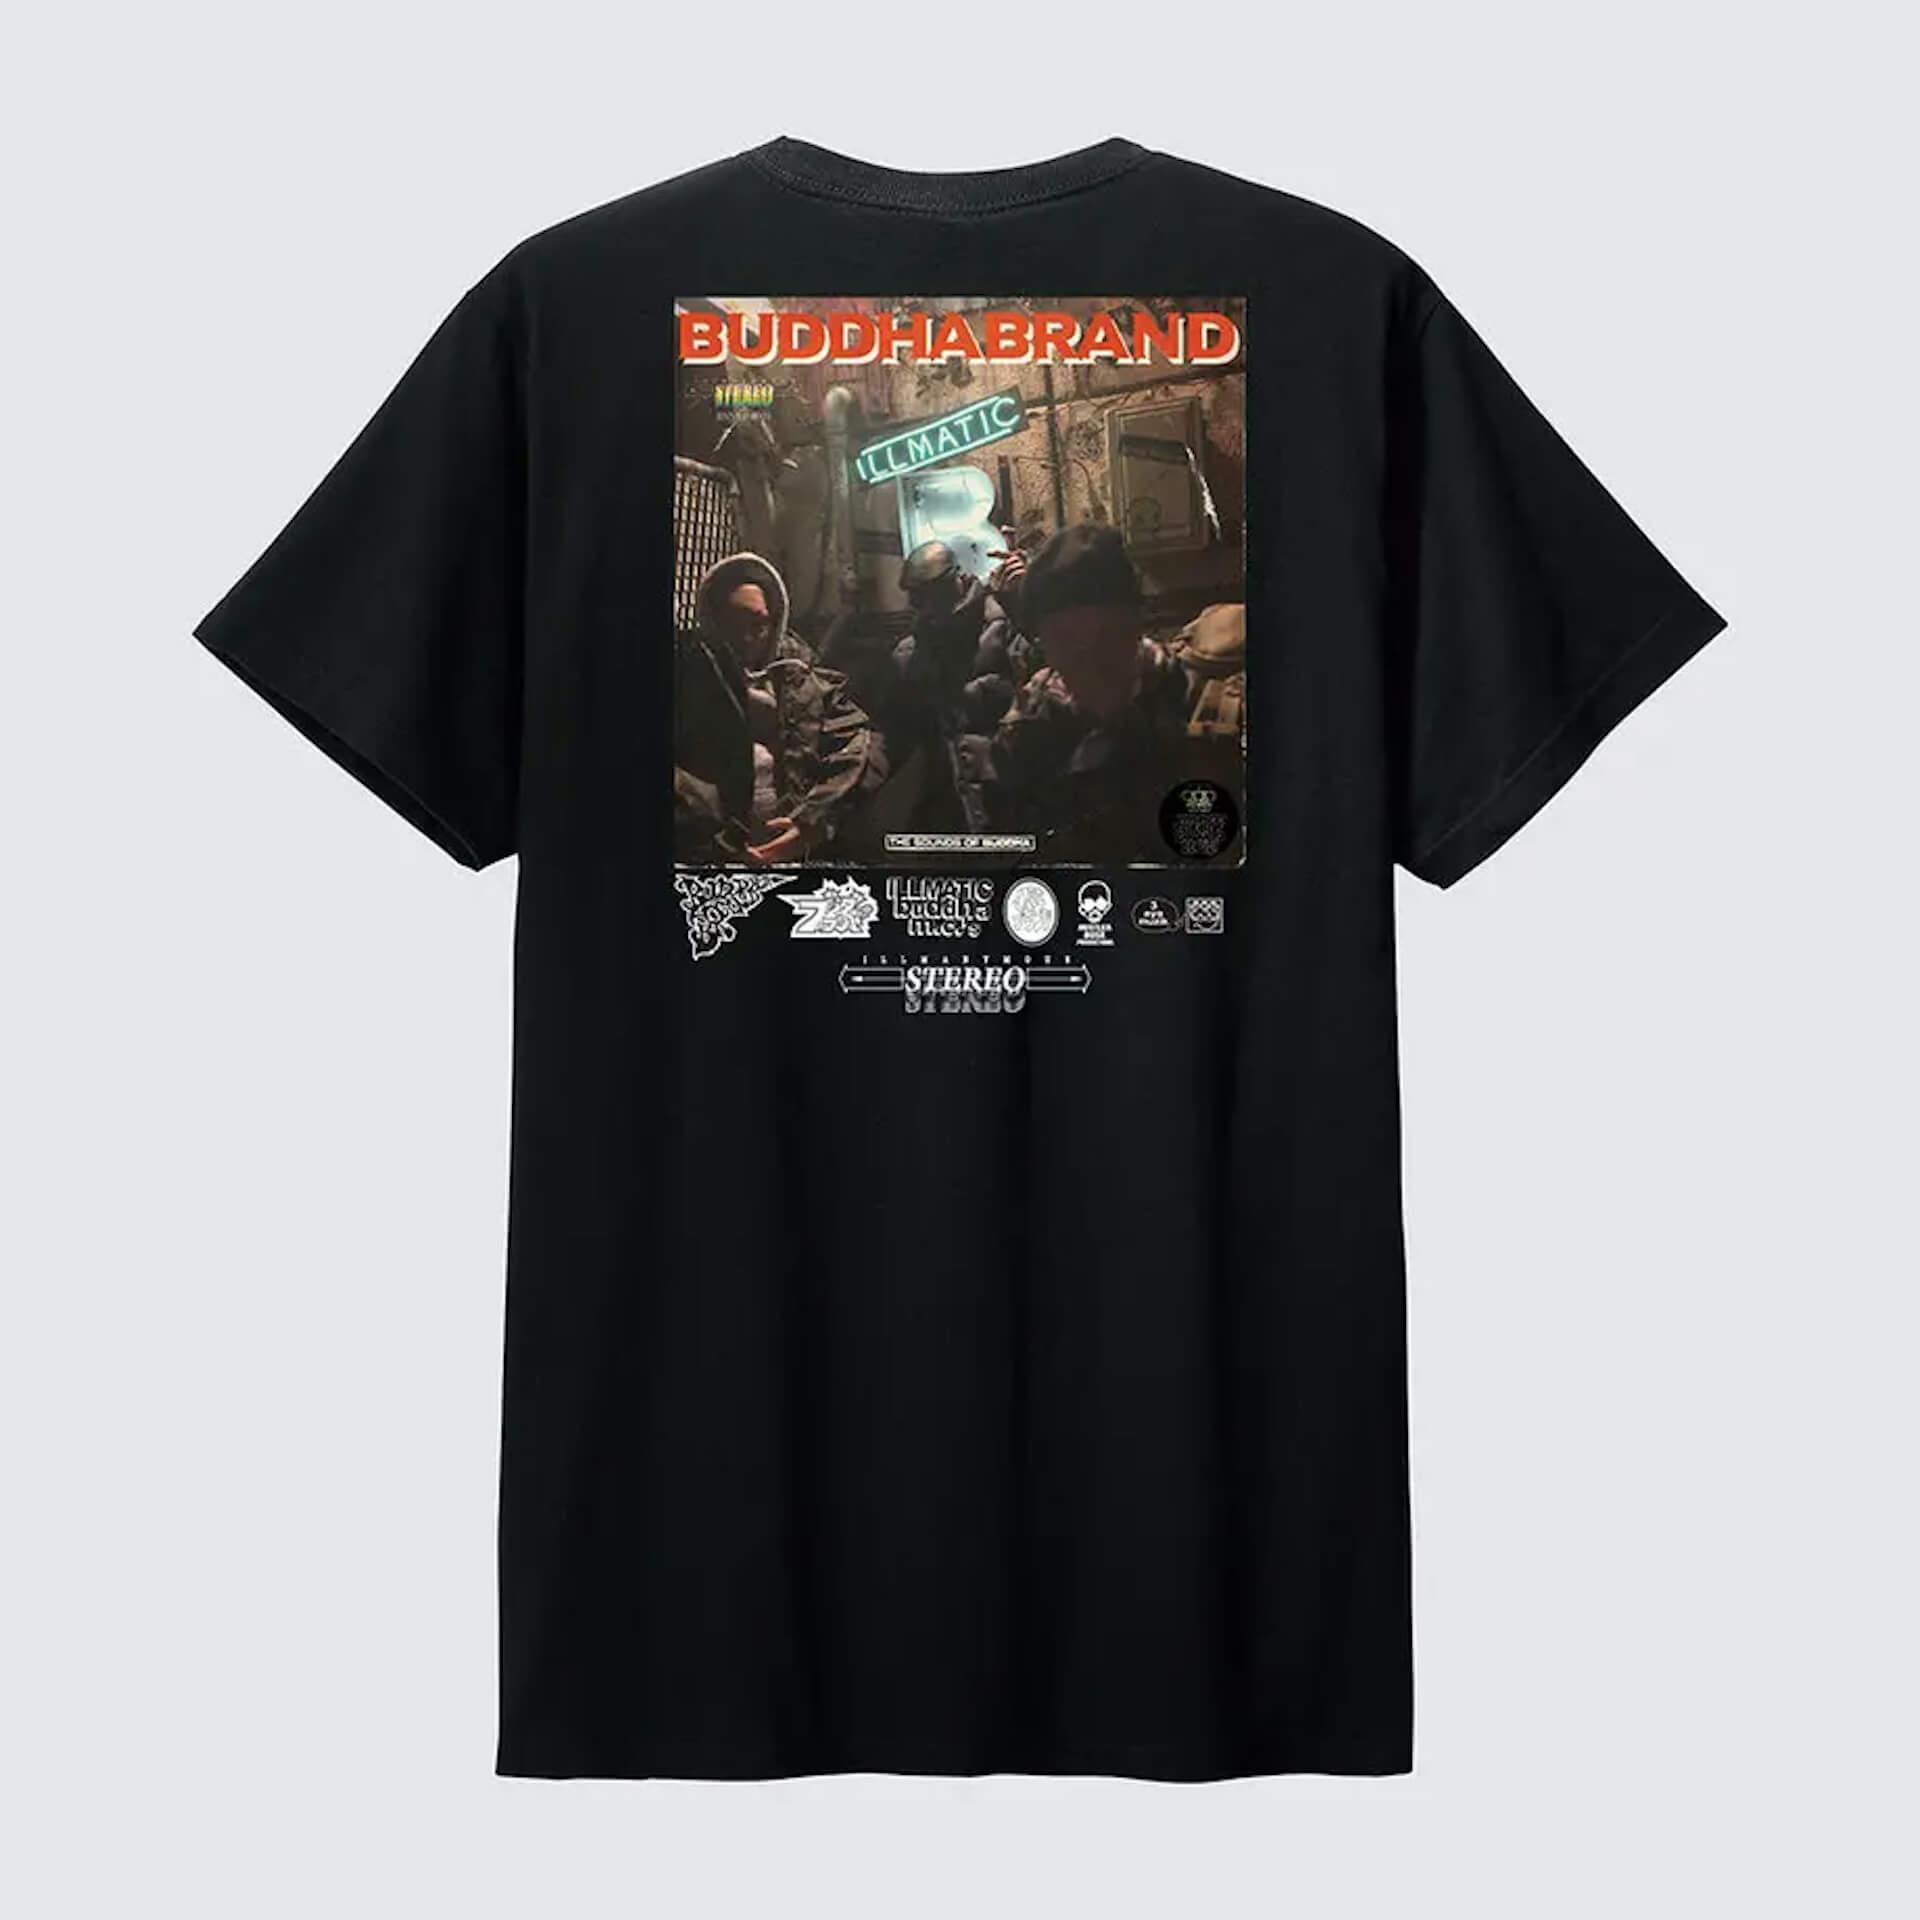 Buddha Brandが『これがブッダブランド!』のTシャツとアルバムをデジタルダウンロードできるセットをリリース決定! music210825_buddha_brand_2